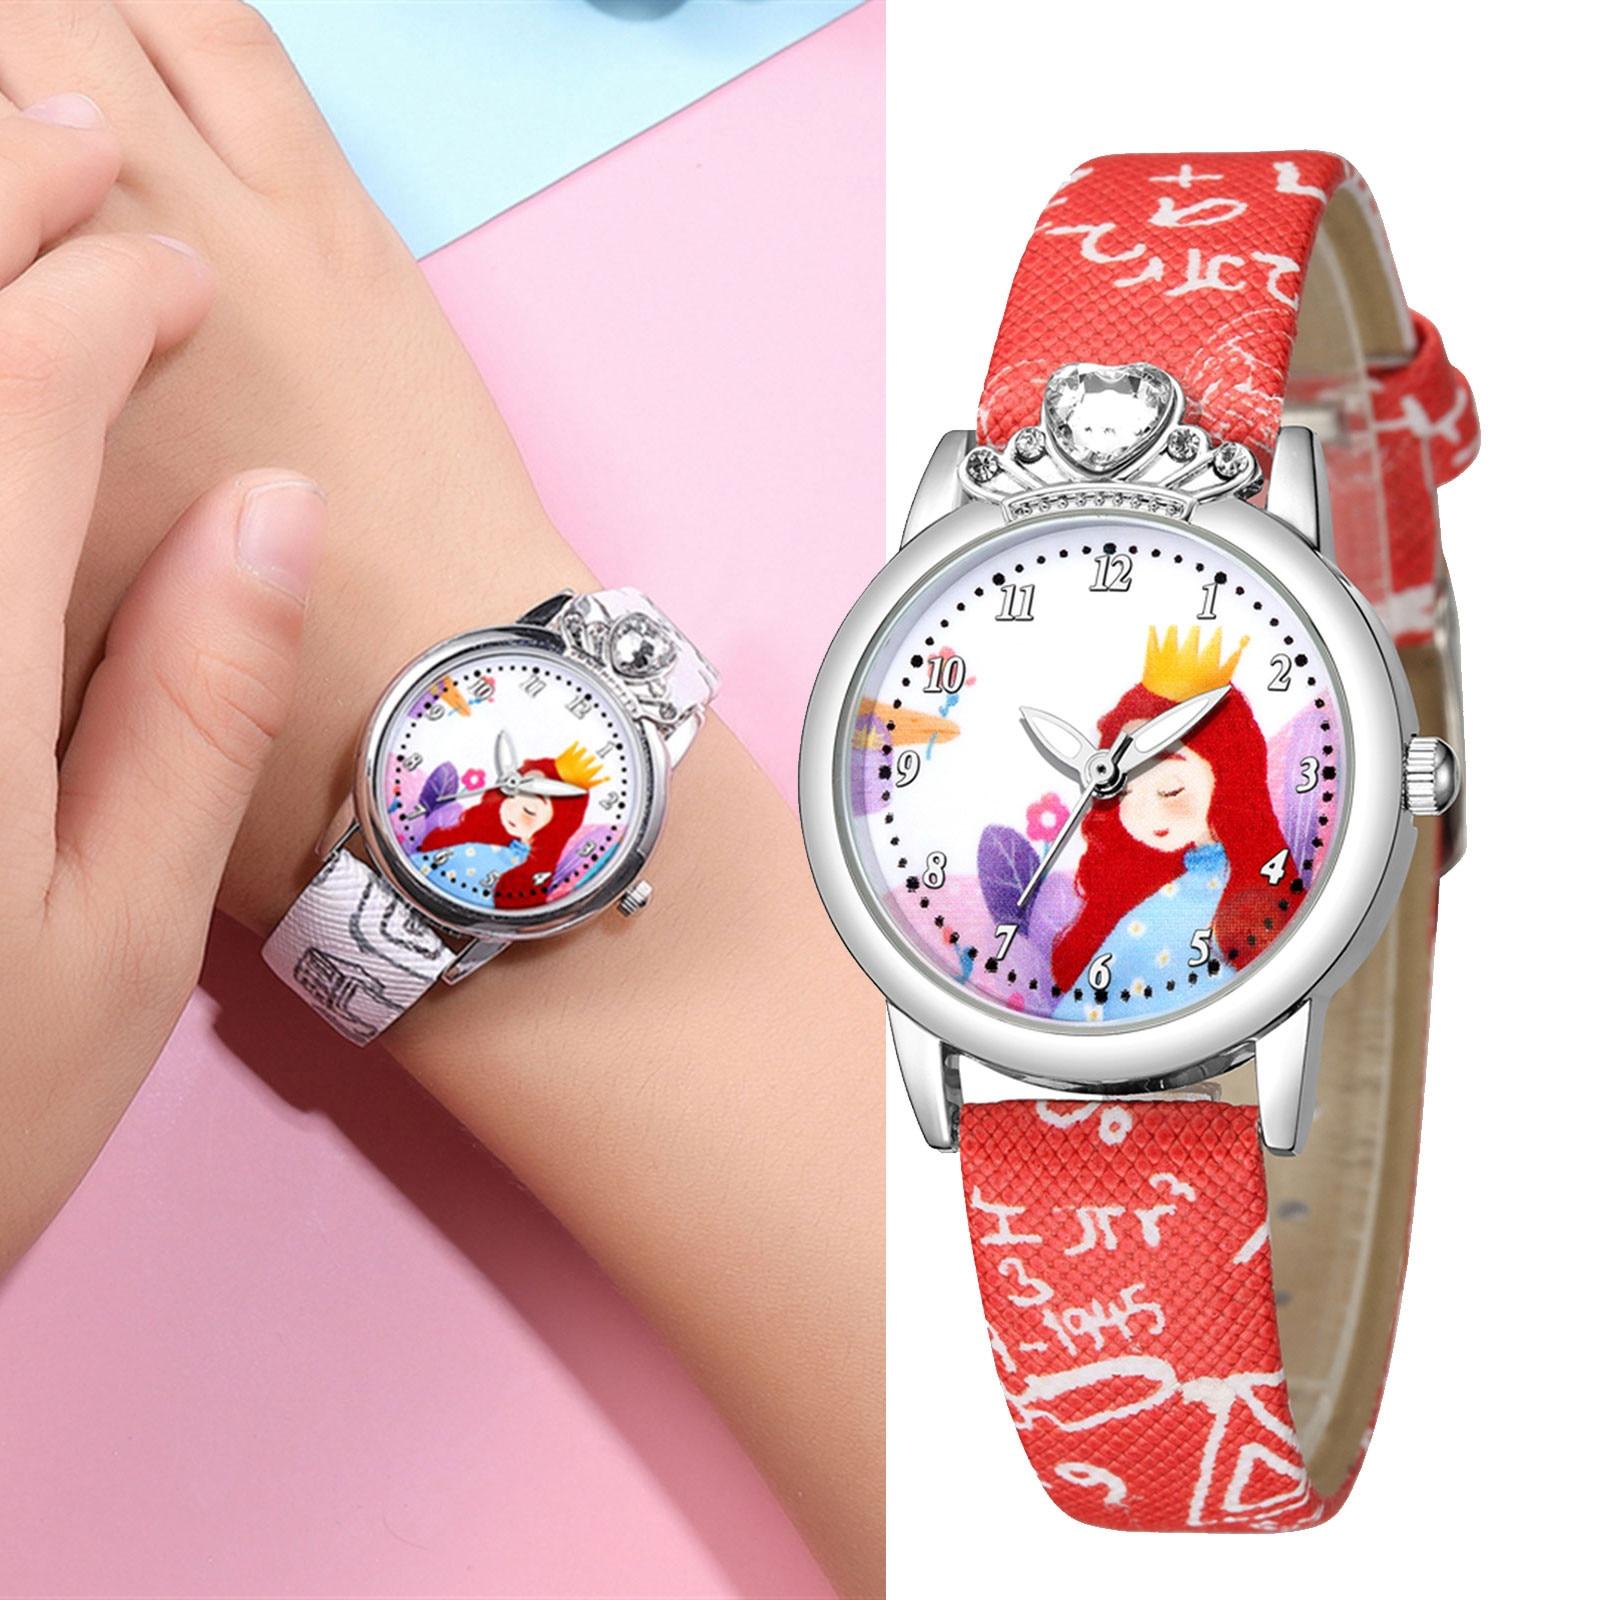 Children's Watches Cartoons Queen Crown Printing Leather Strap Child Watch For Christmas Thanksgiving Present Часы Женские